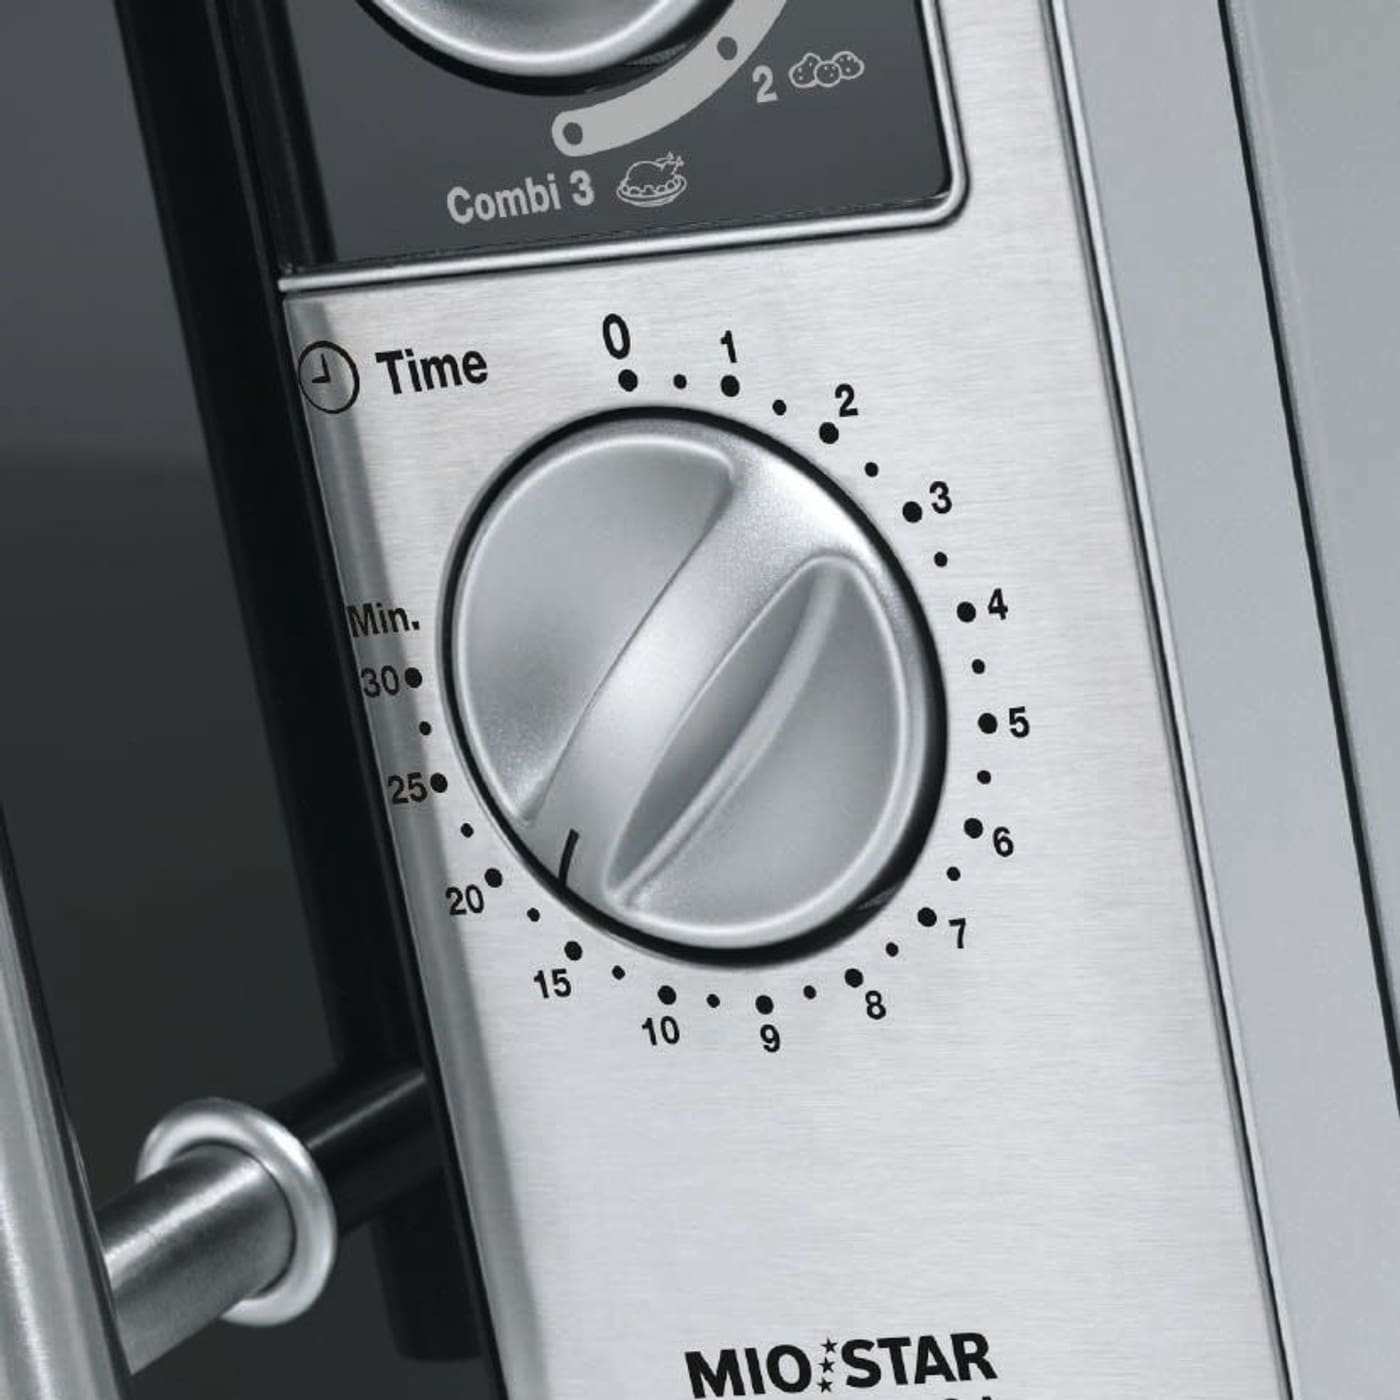 Mikrowelle Ja Oder Nein mikrowelle ja oder nein digitales bauknecht mikrowelle farbe